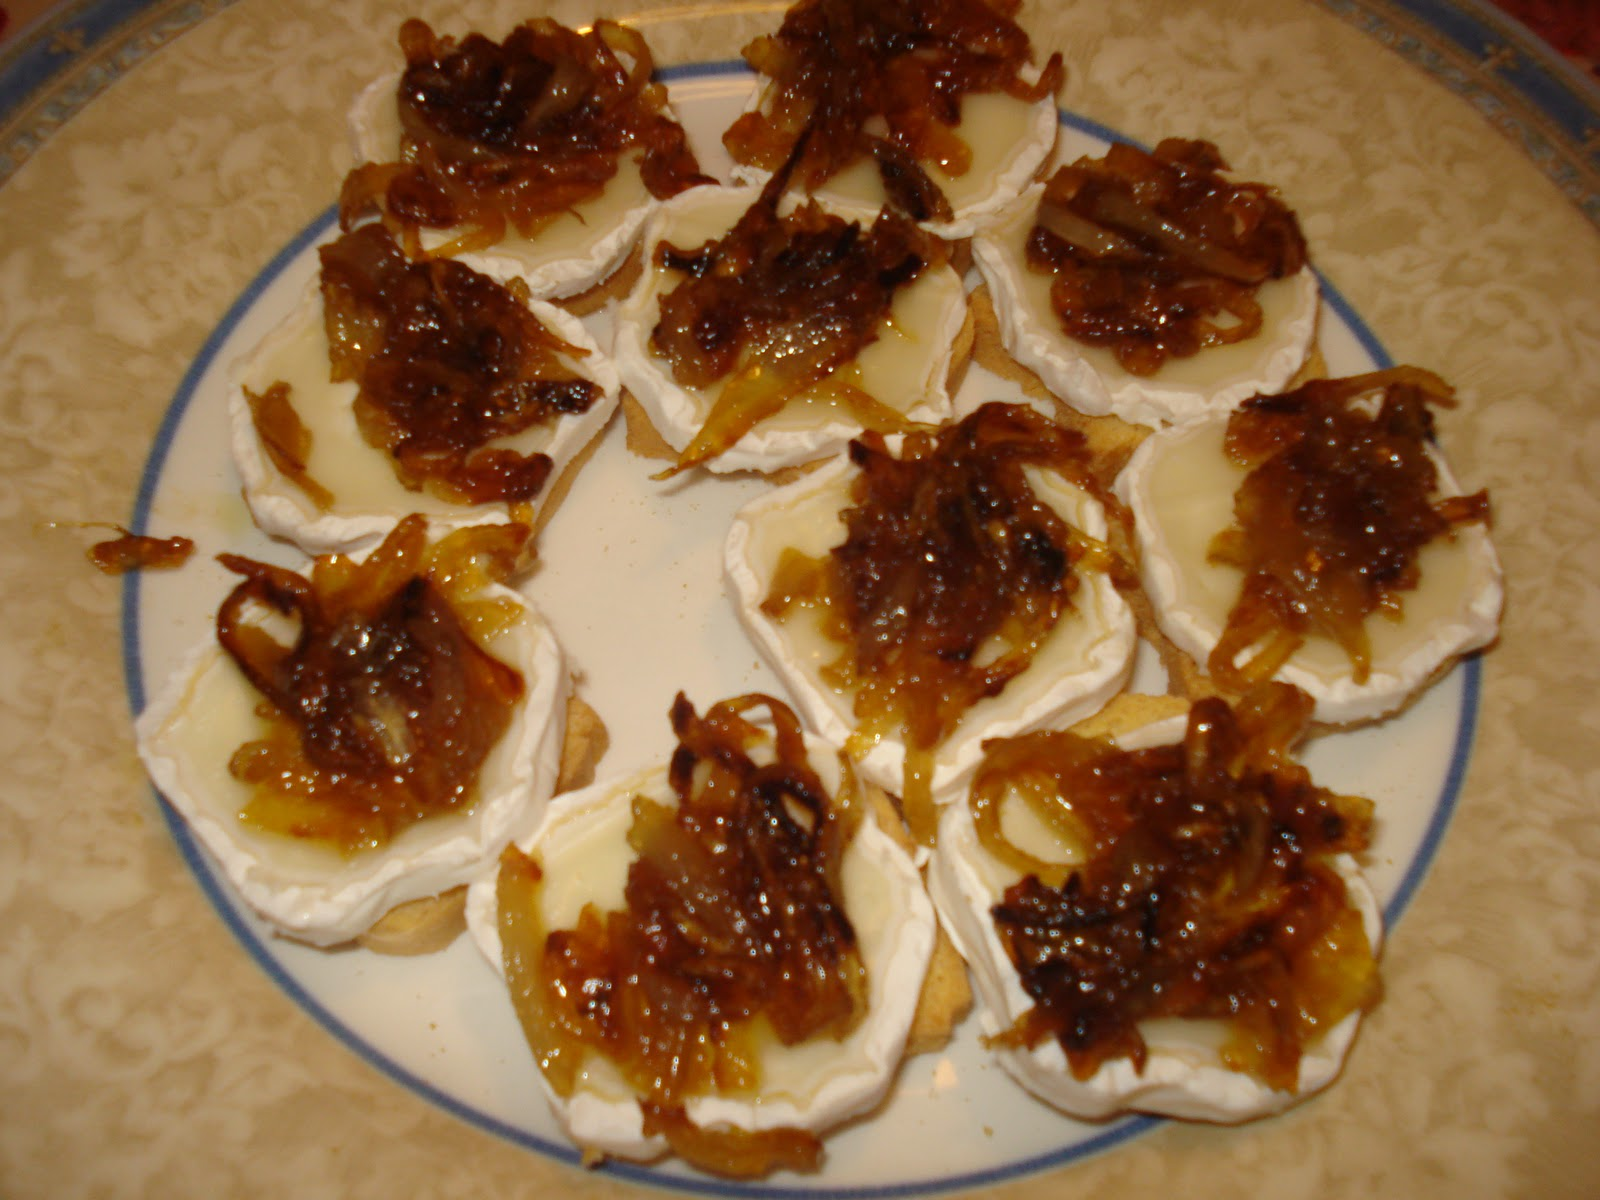 Tostadas de queso de cabra con cebolla caramelizada 4 1 5 for Canape de pate con cebolla caramelizada